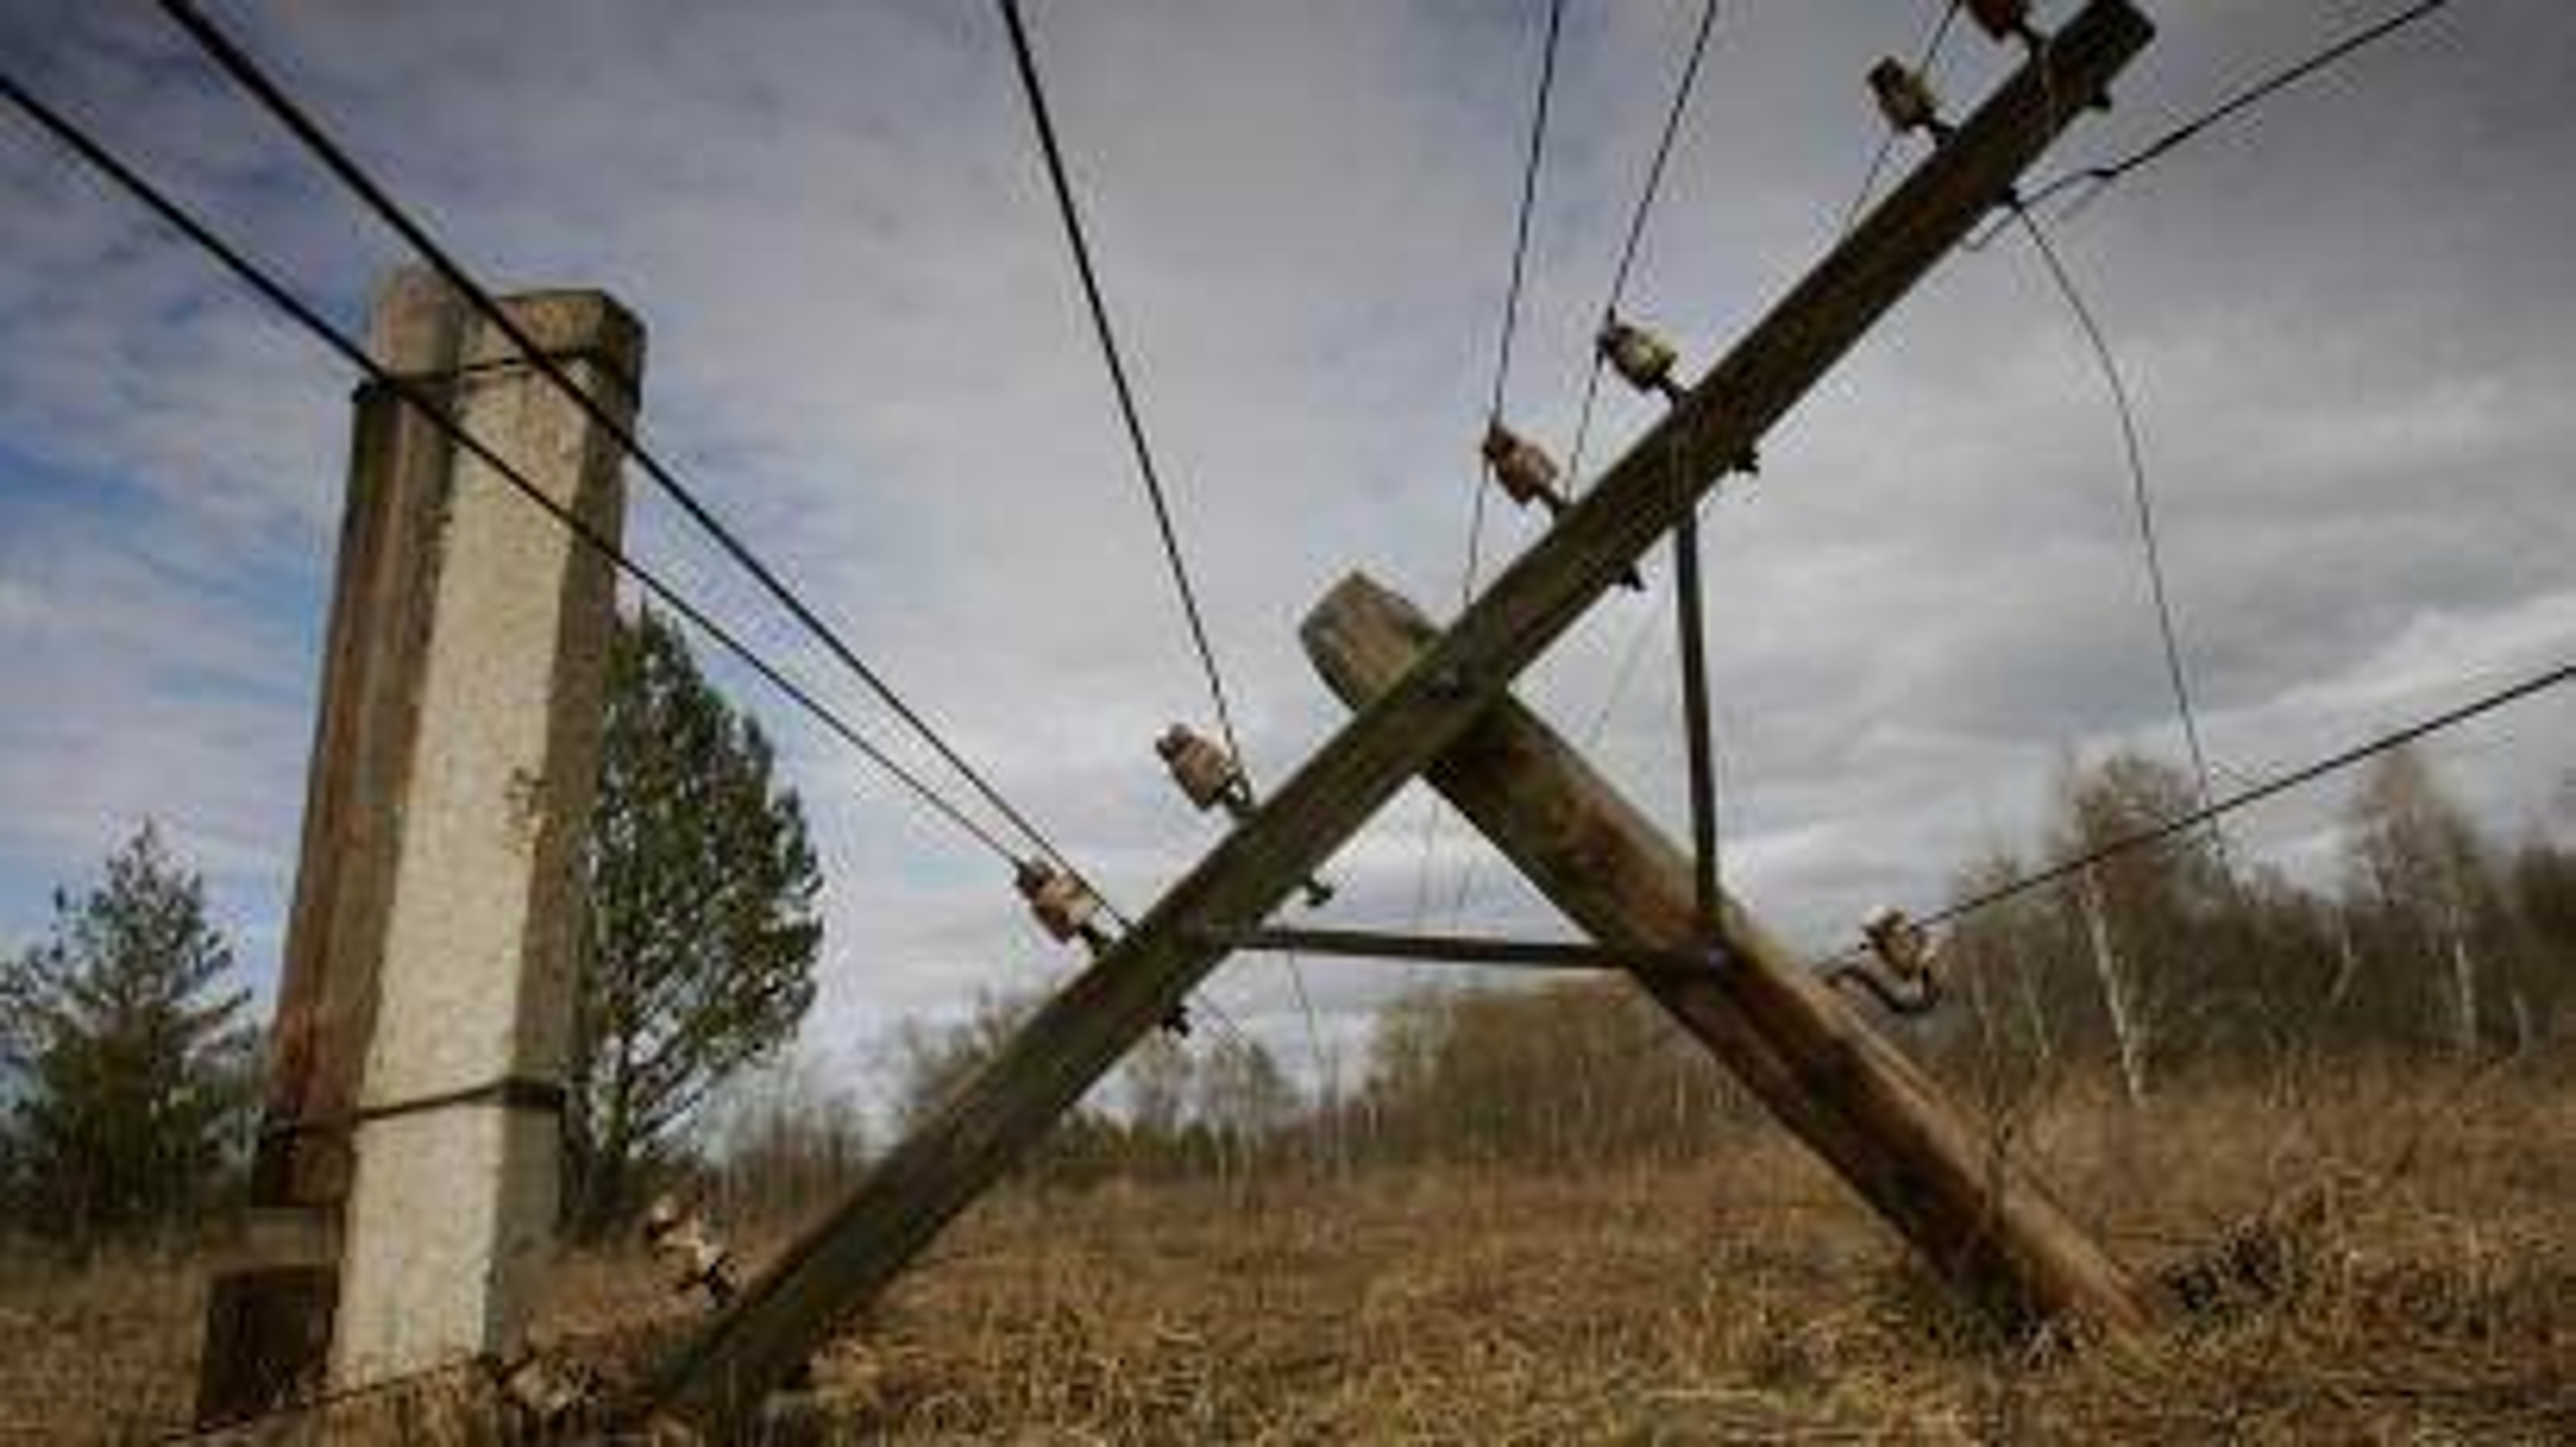 Broken telegraph pole